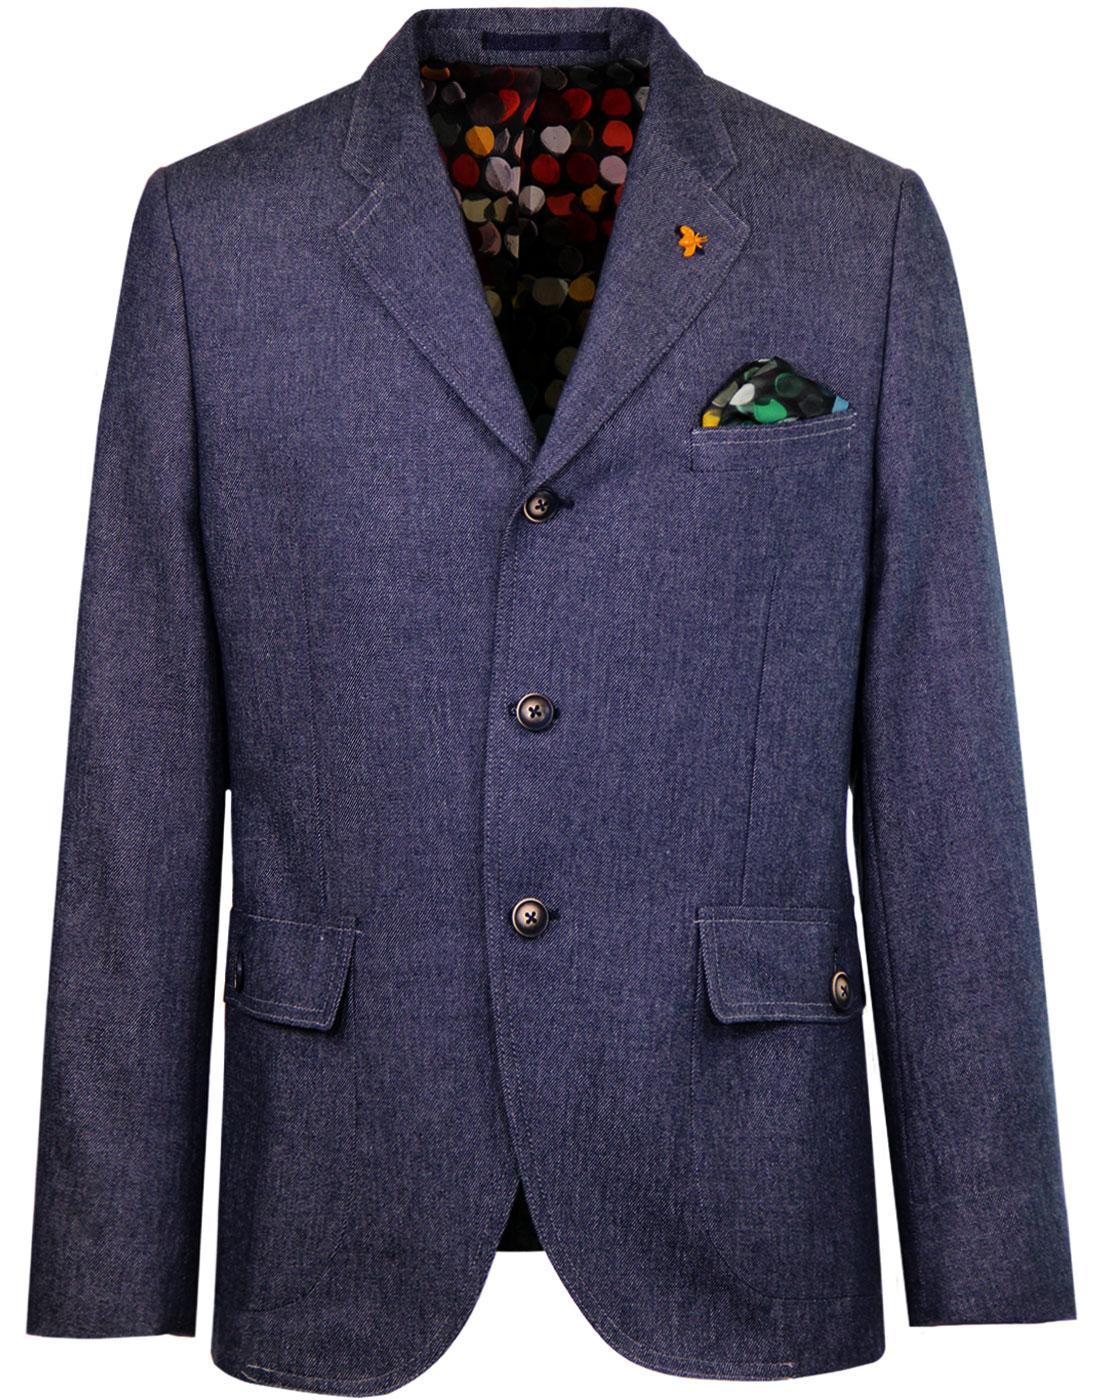 Grouse GIBSON LONDON Oxford Twill 3 Button Blazer